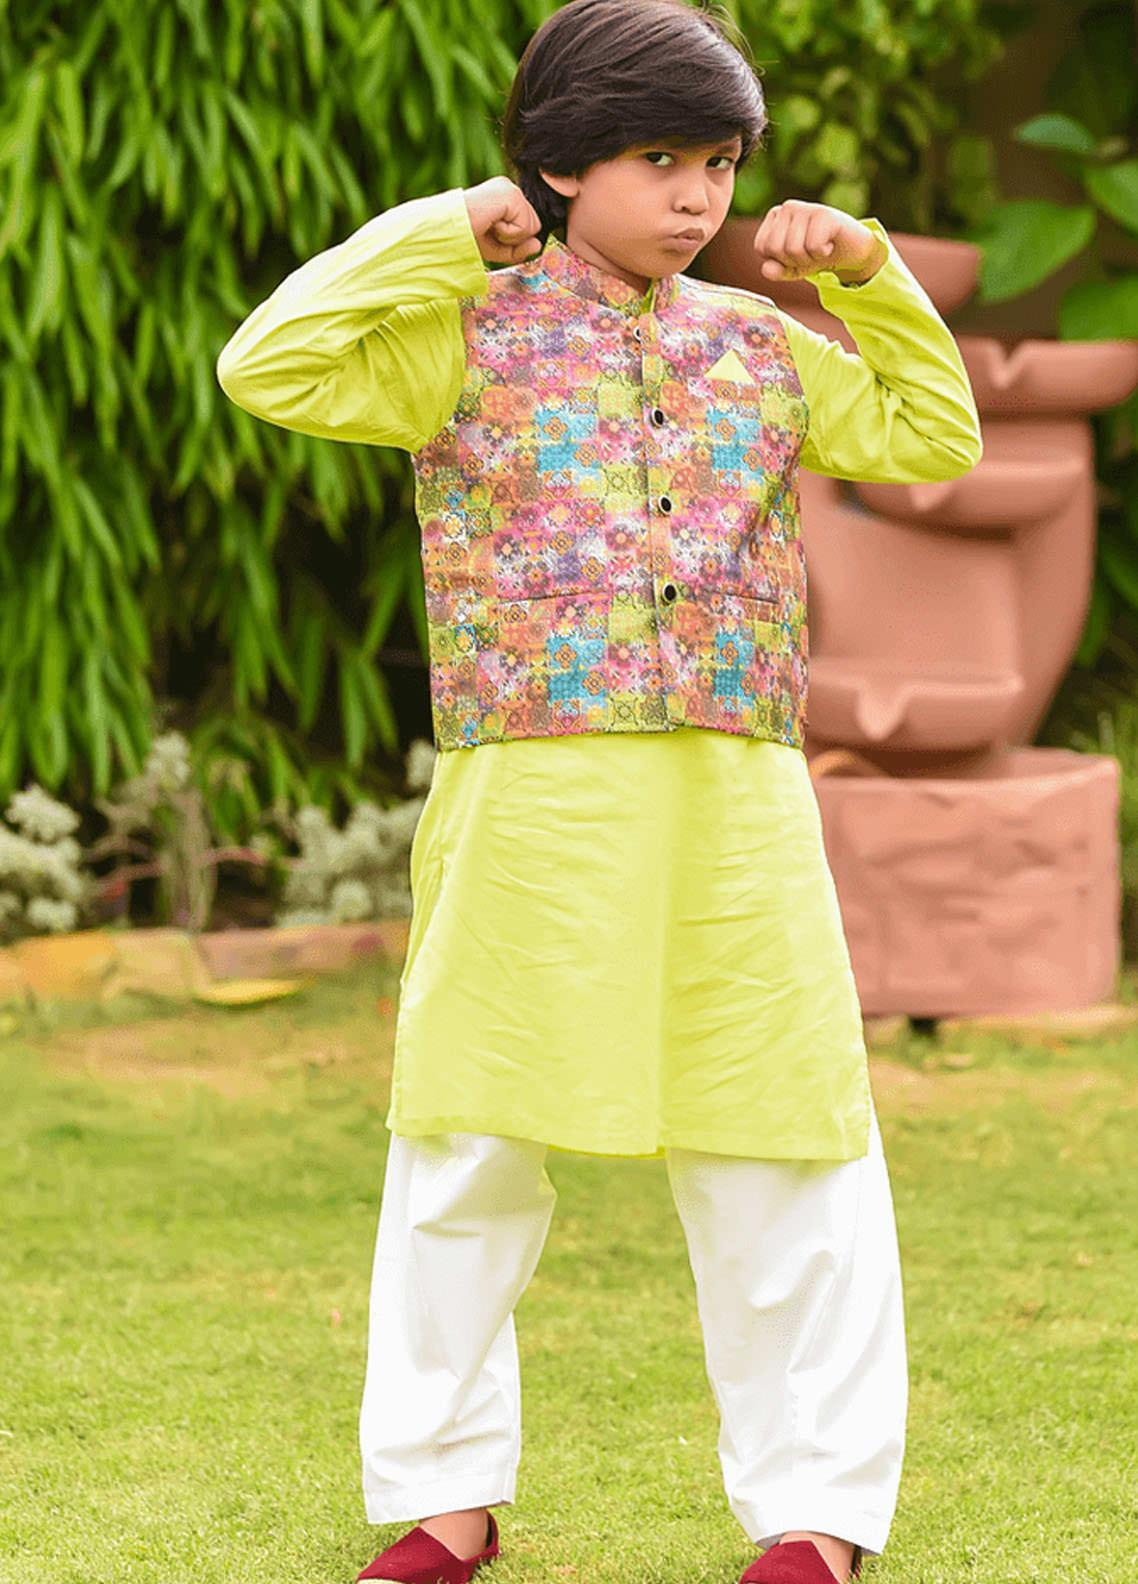 Ochre Cotton Formal Kurta Shalwar with Waistcoat for Boys -  OBK-11 Lime Green